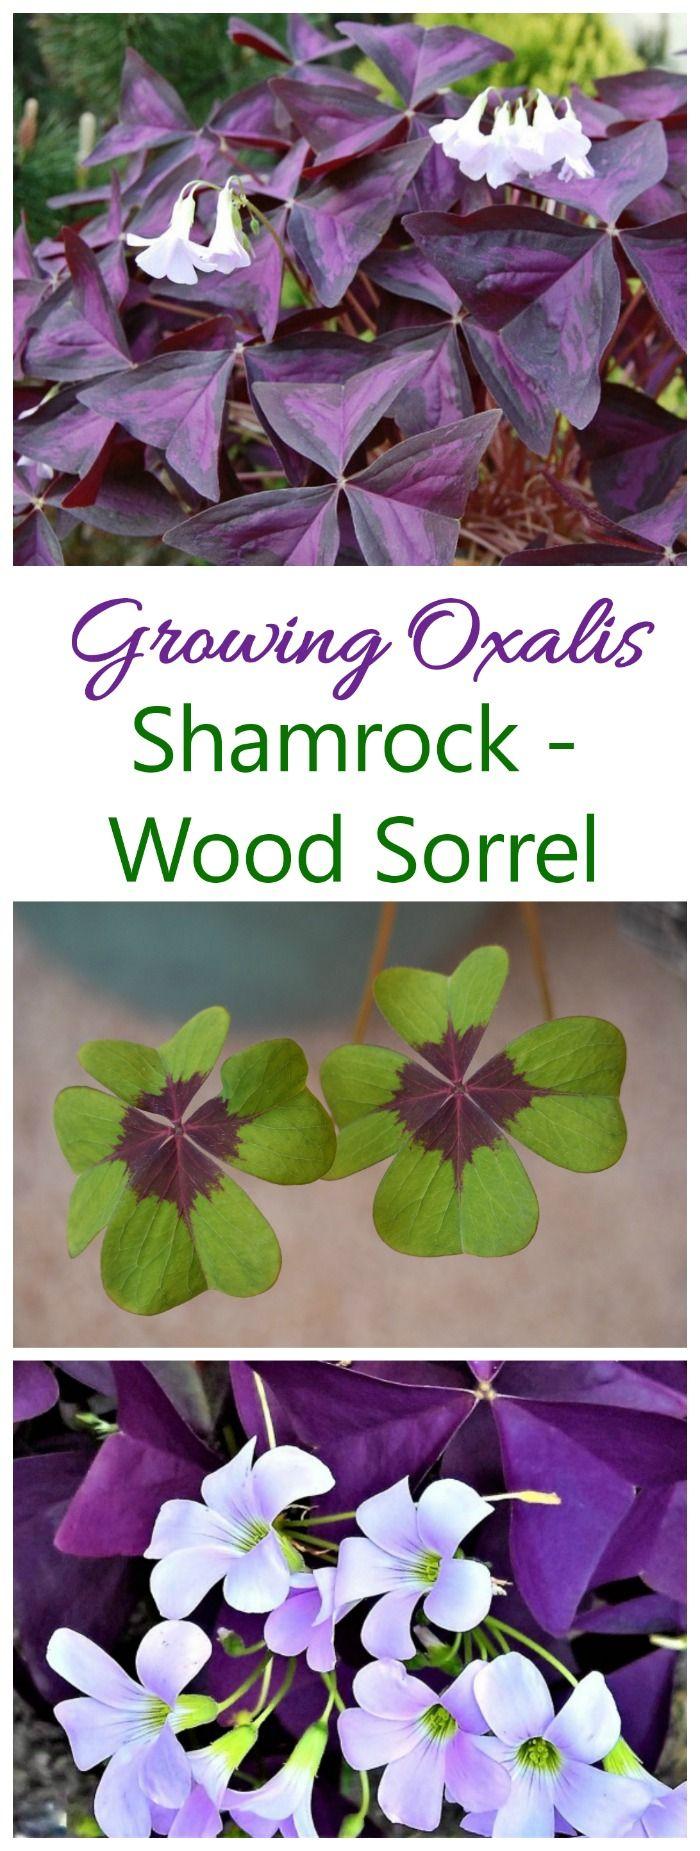 Growing oxalis outdoors or inside as a house plant is easy. #oxalis #woodsorrel #falsesharmrock